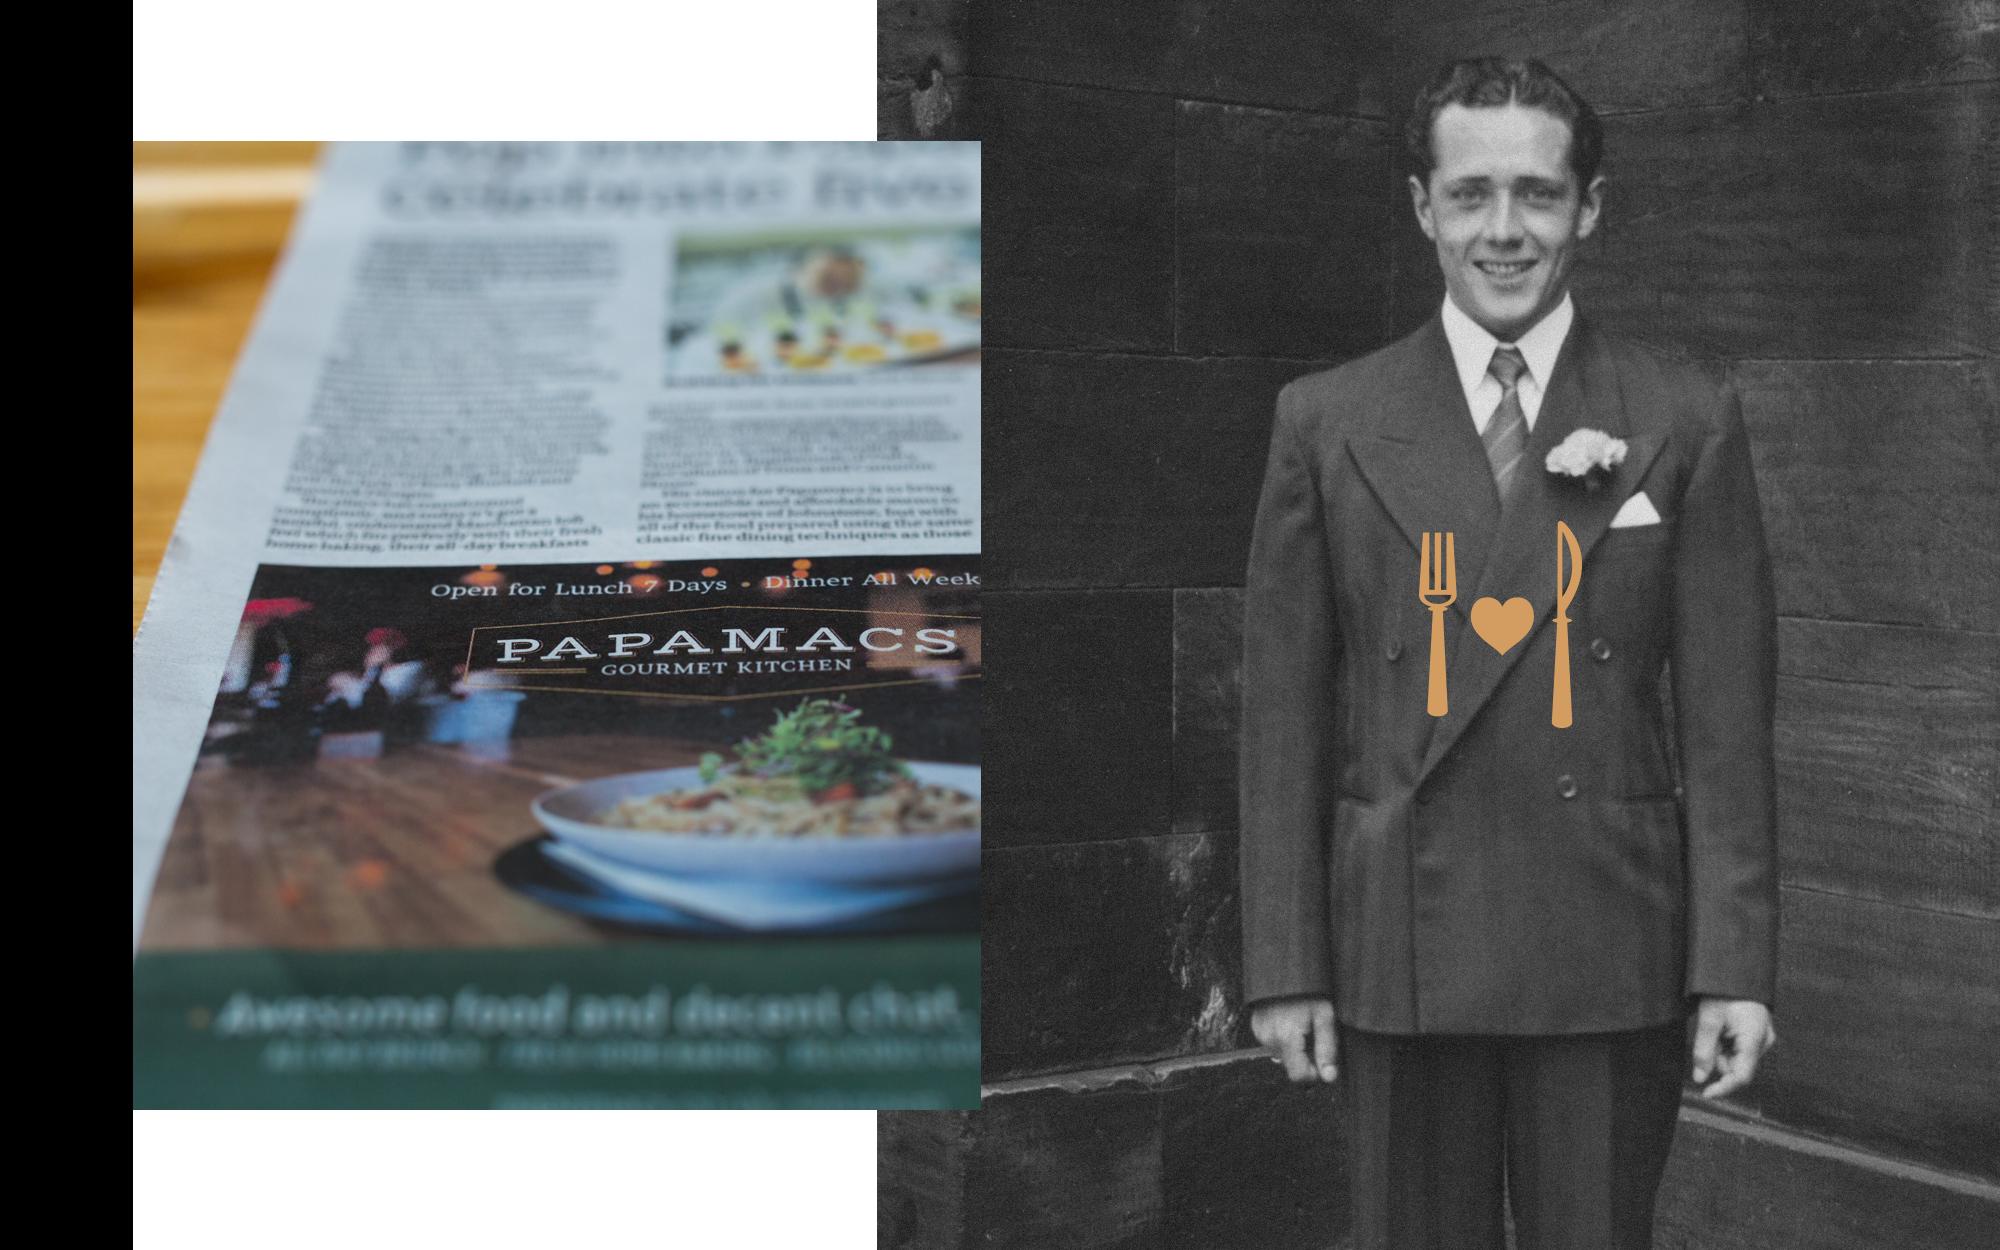 restaurant-glasgow-PR-newspaper-heritage-retro-photo-papamacs.png